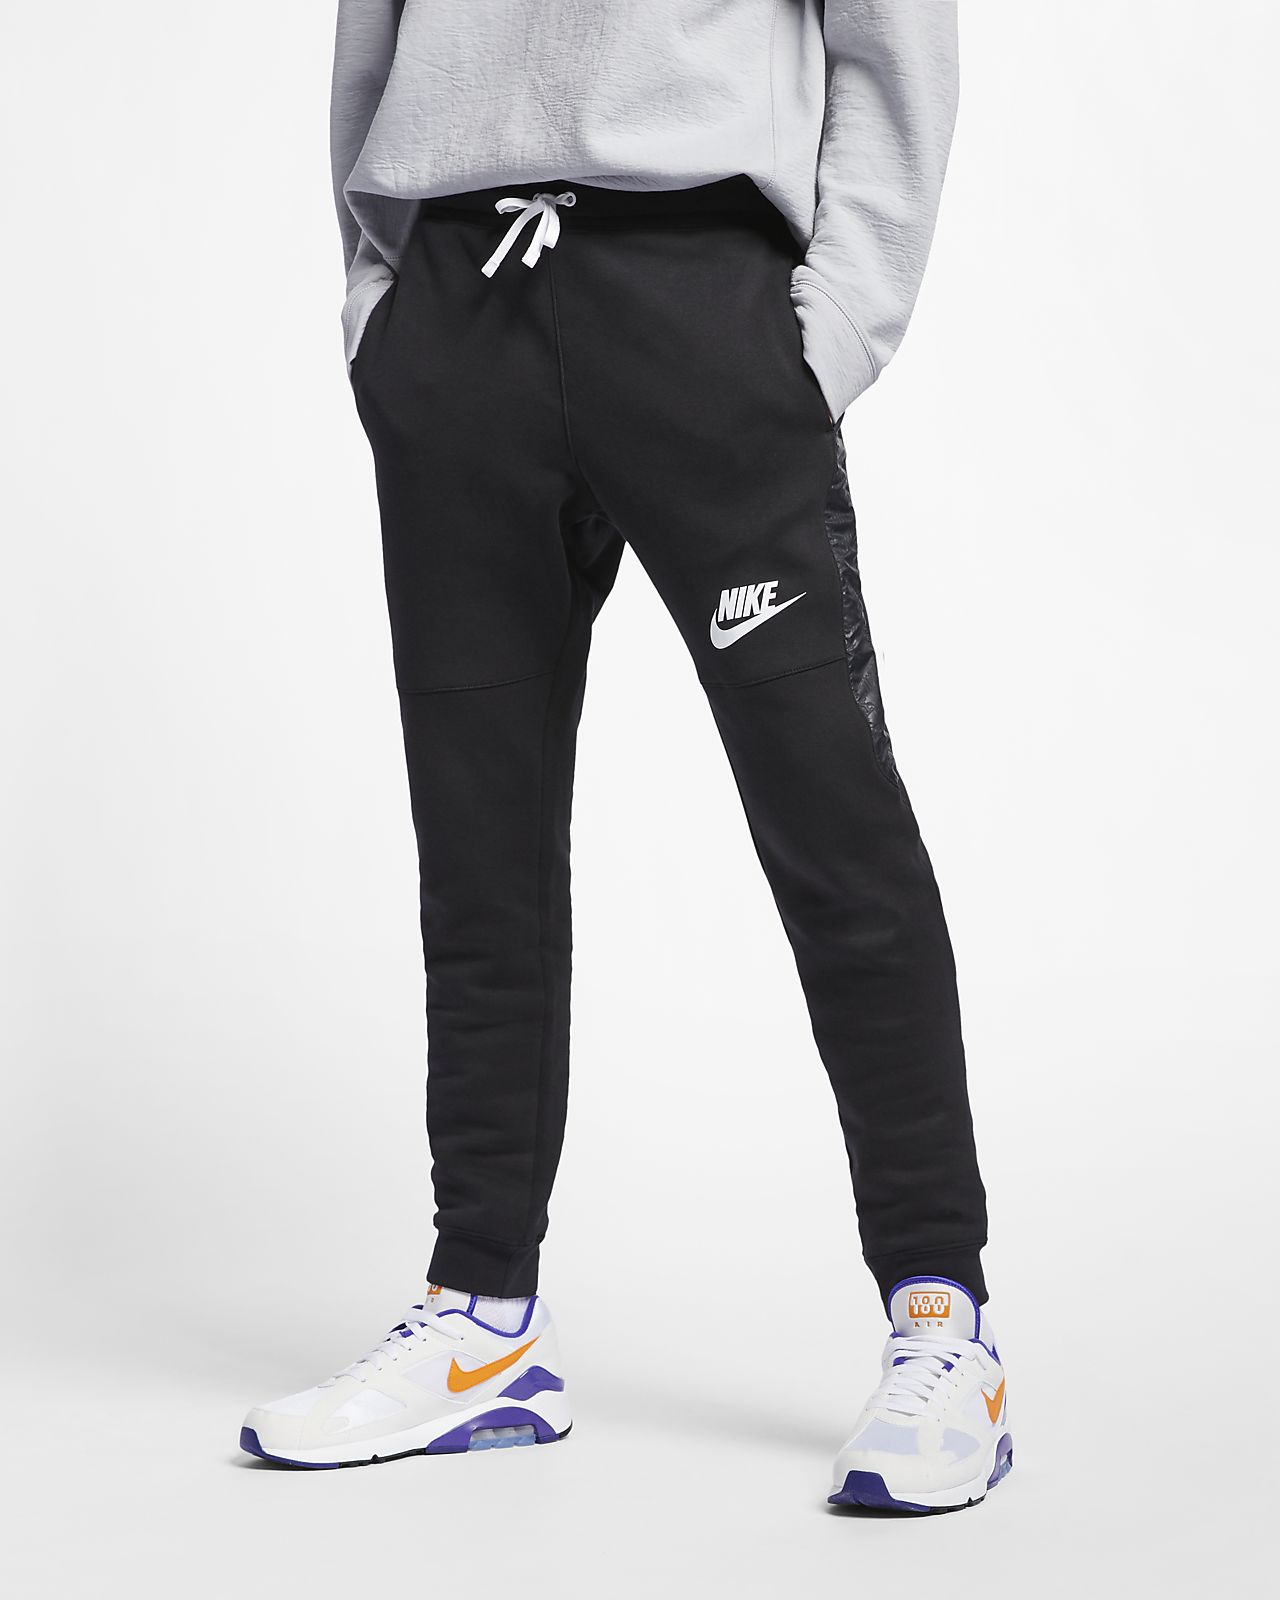 Nike Homme De Jogging Sportswear Pantalon Pour UjLSzMpVqG